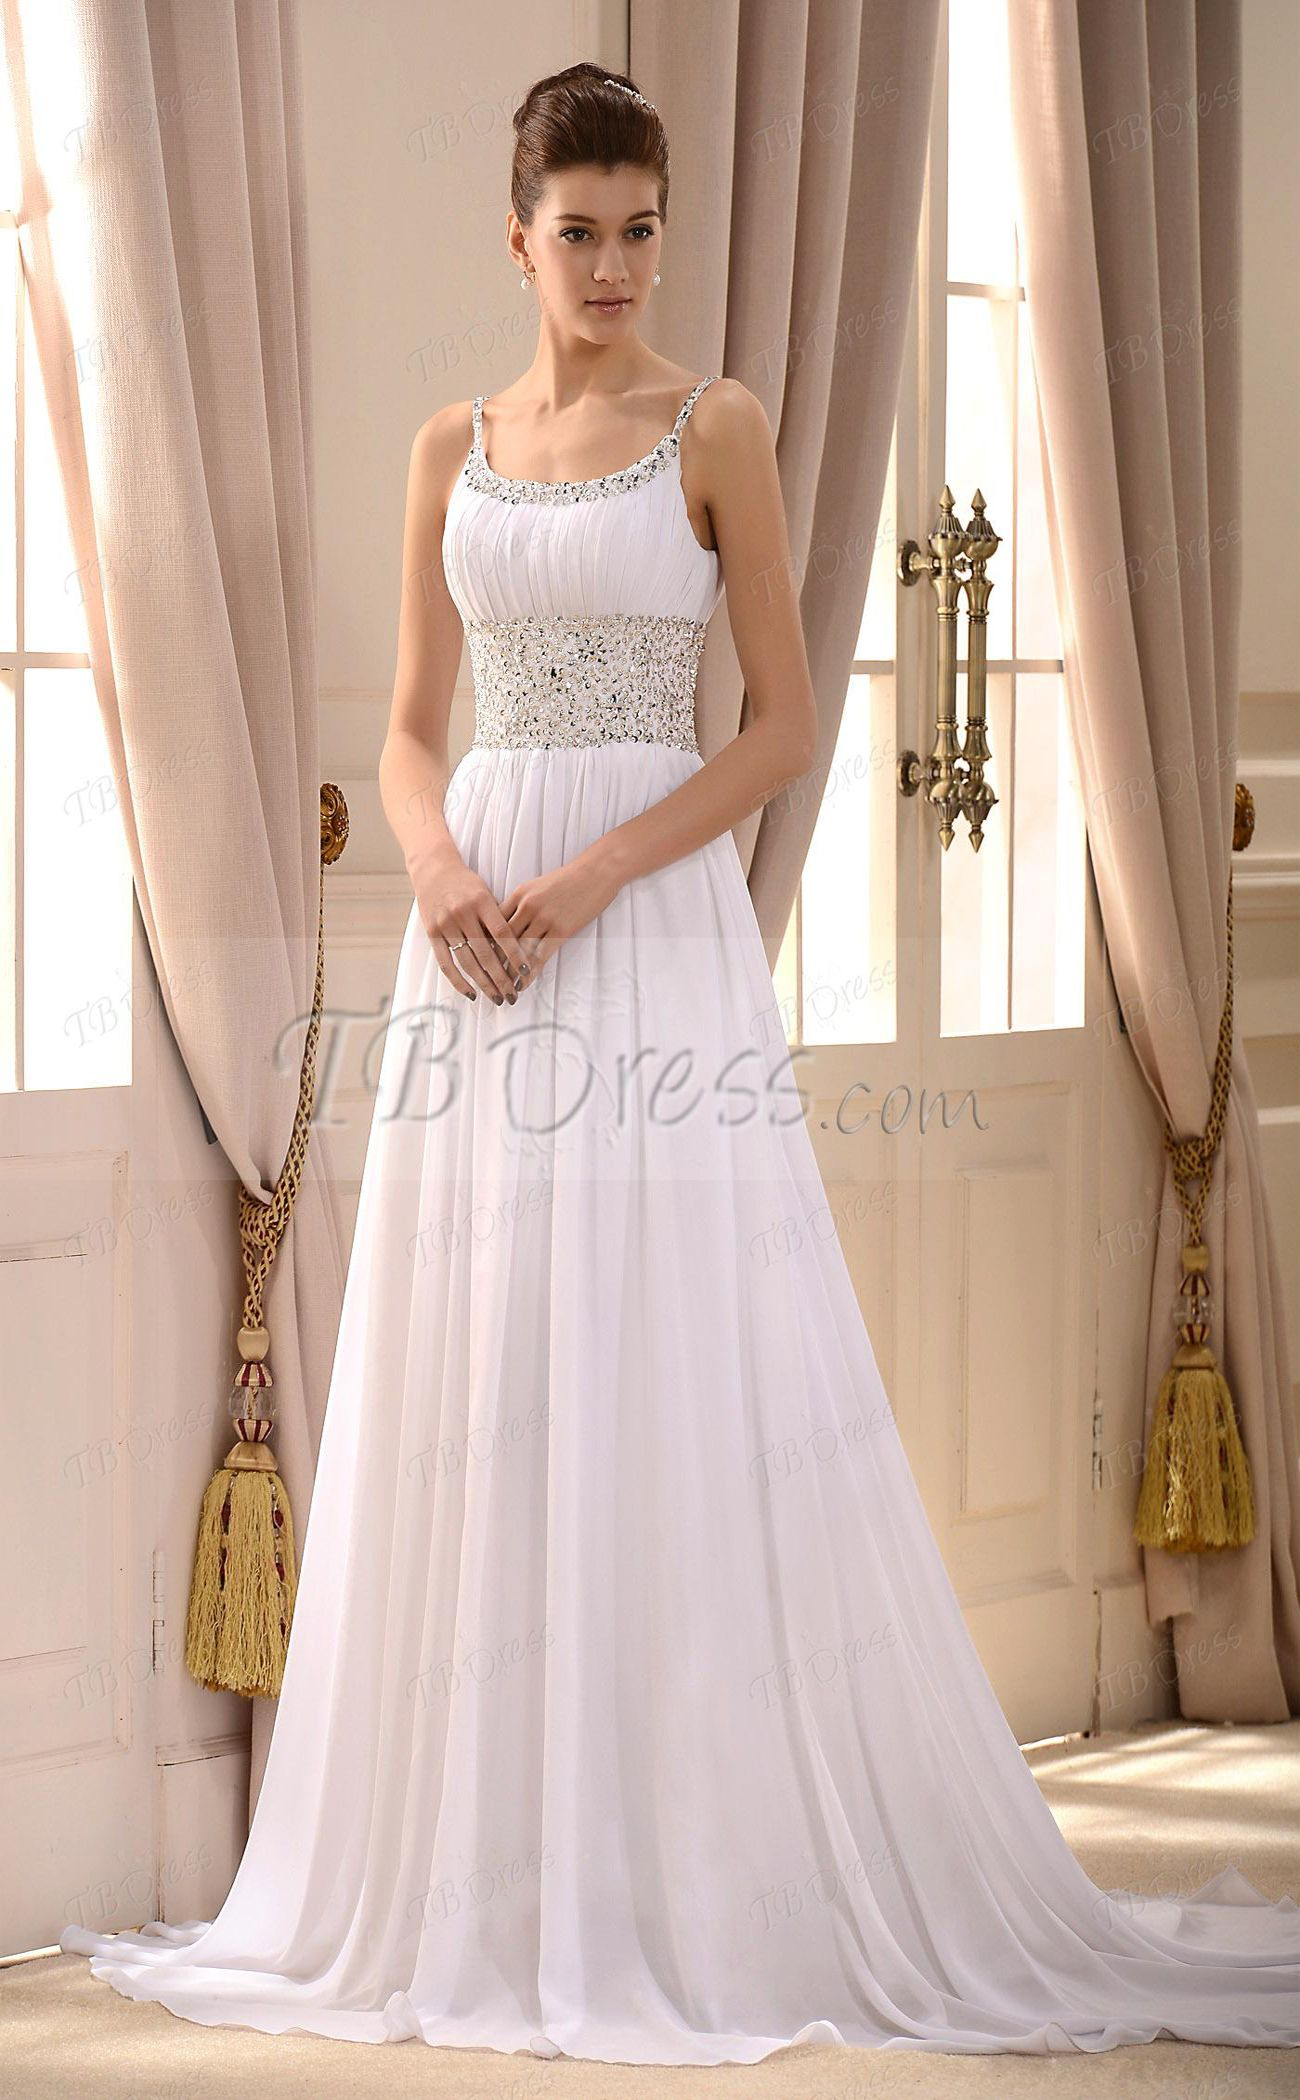 Empire spaghetti straps sleeveless court train wedding dress